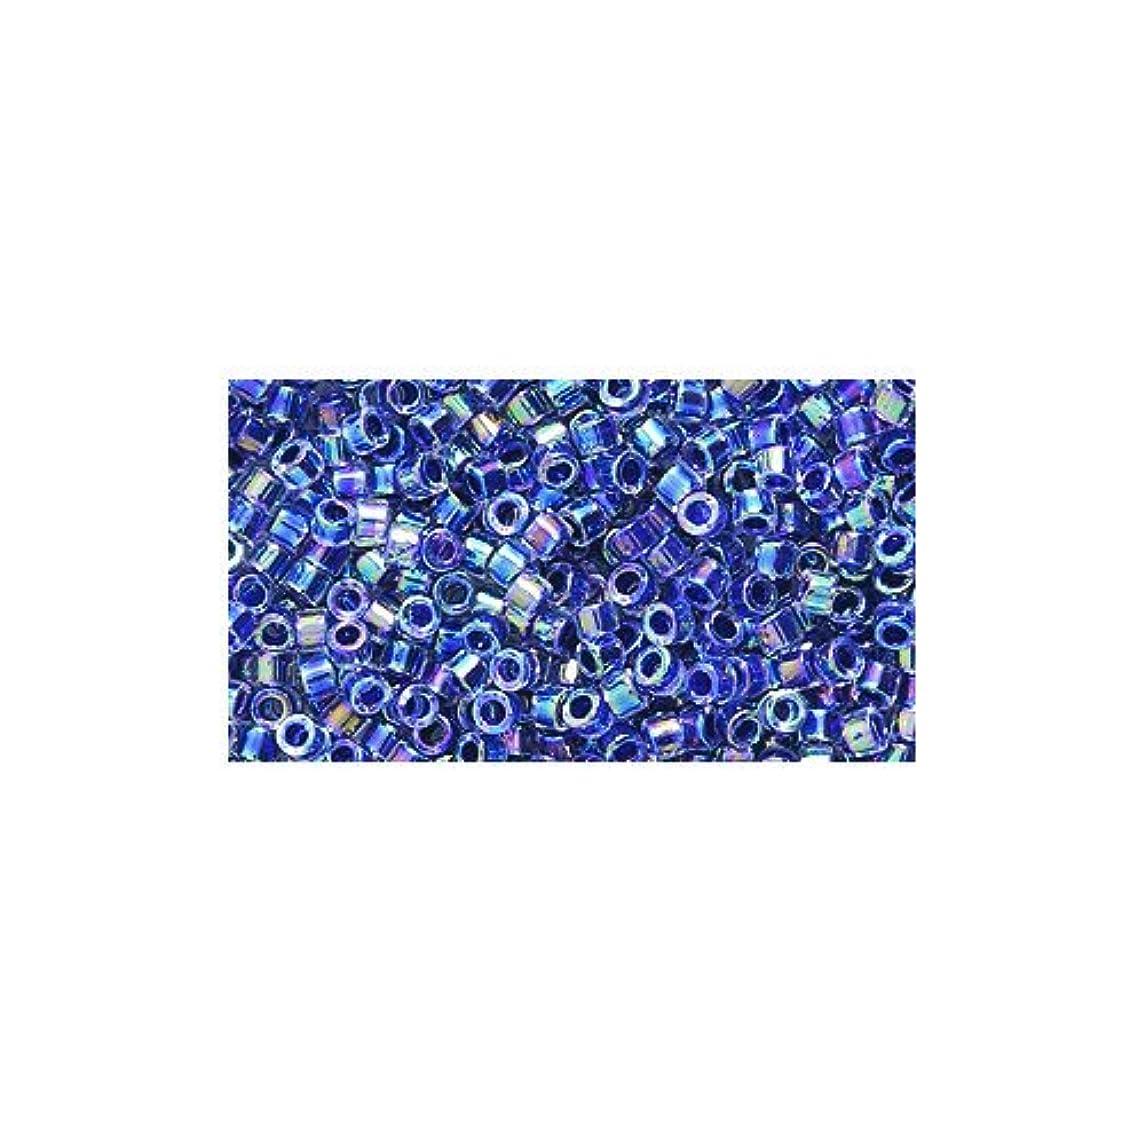 Miyuki Delica Seed Bead 11/0 DB059, Colorlined Amethyst Aurora Borealis Finish, 9-Gram/Pack